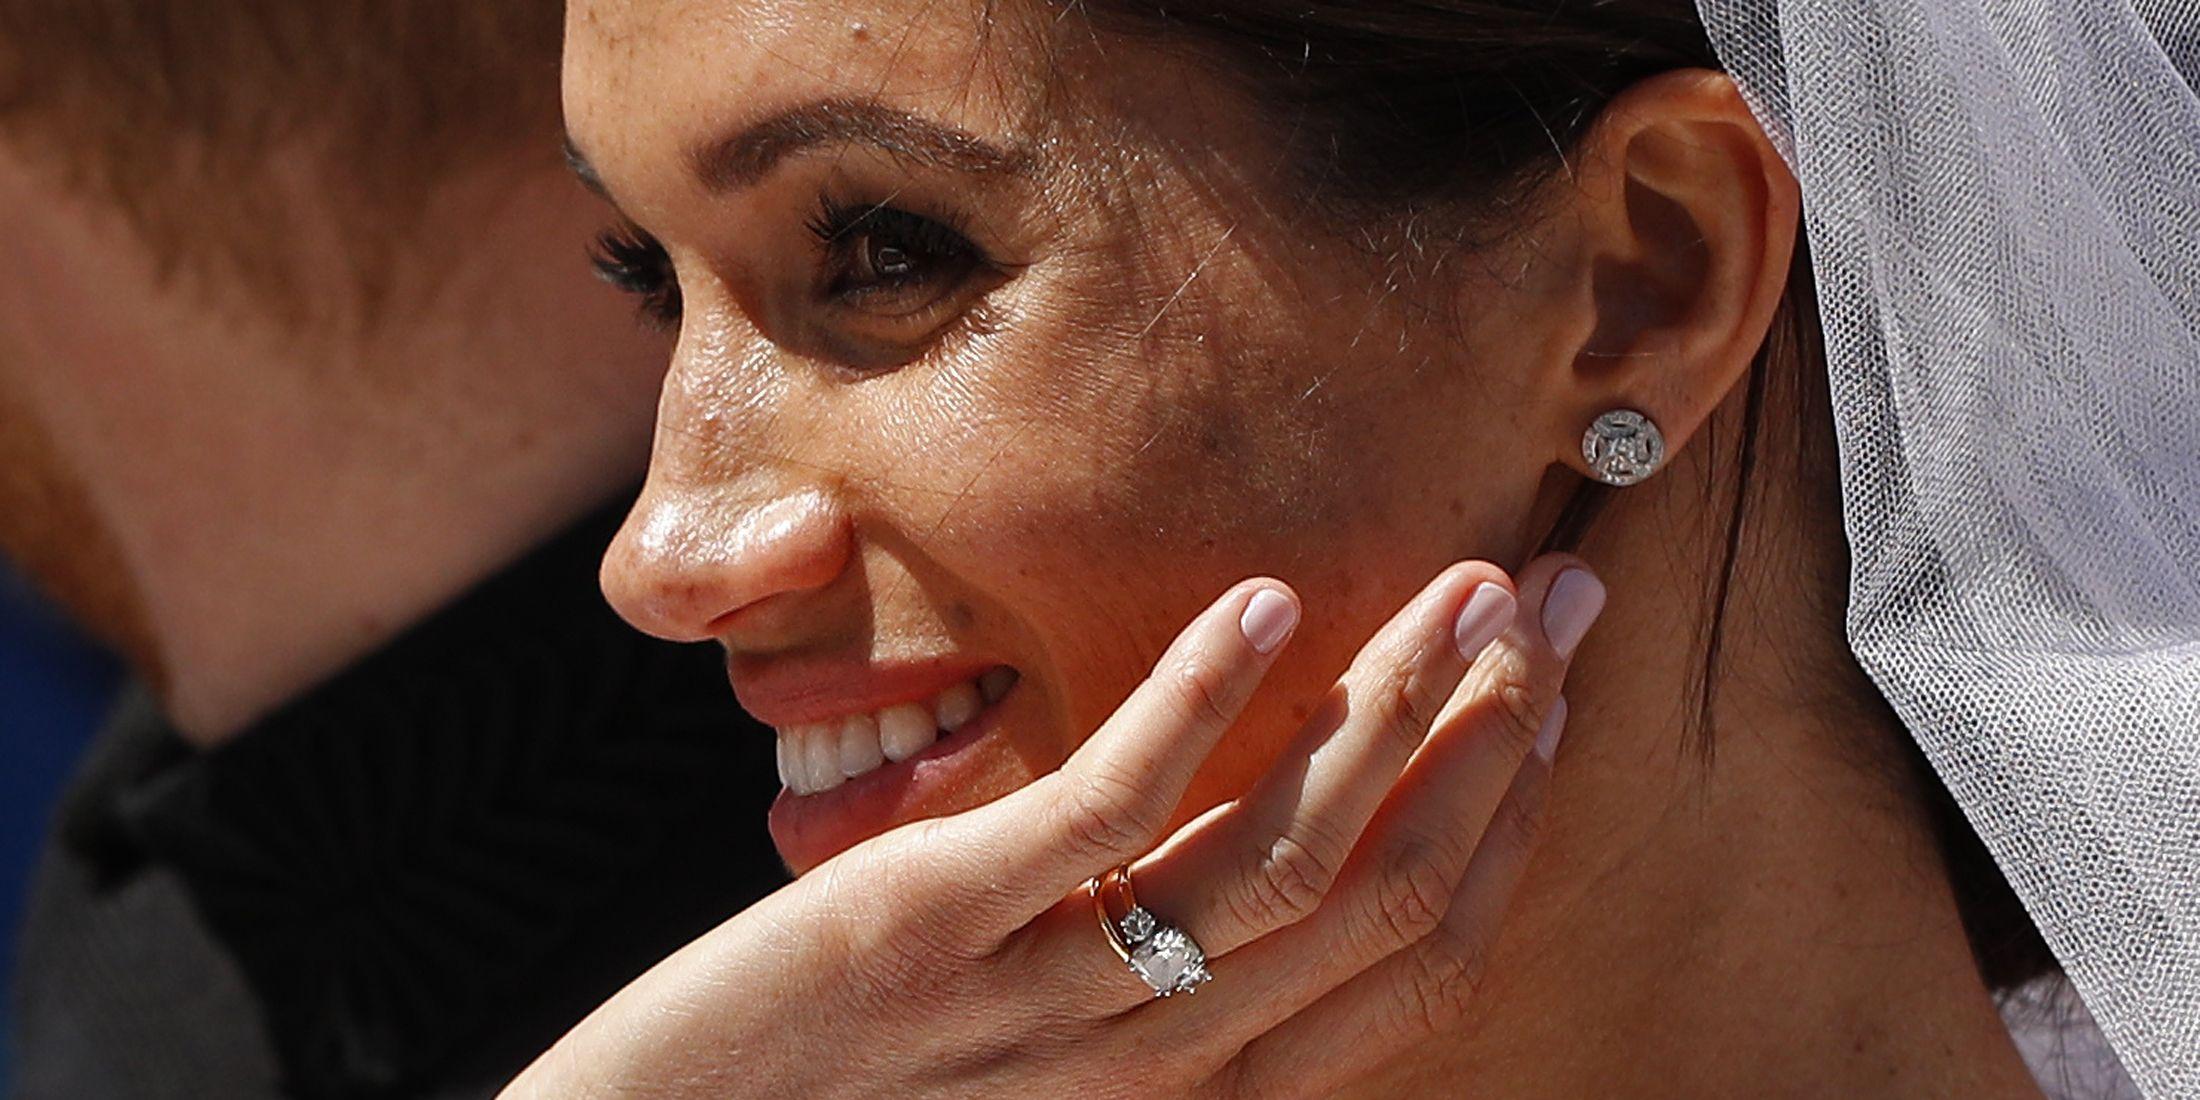 meghan markle manicure